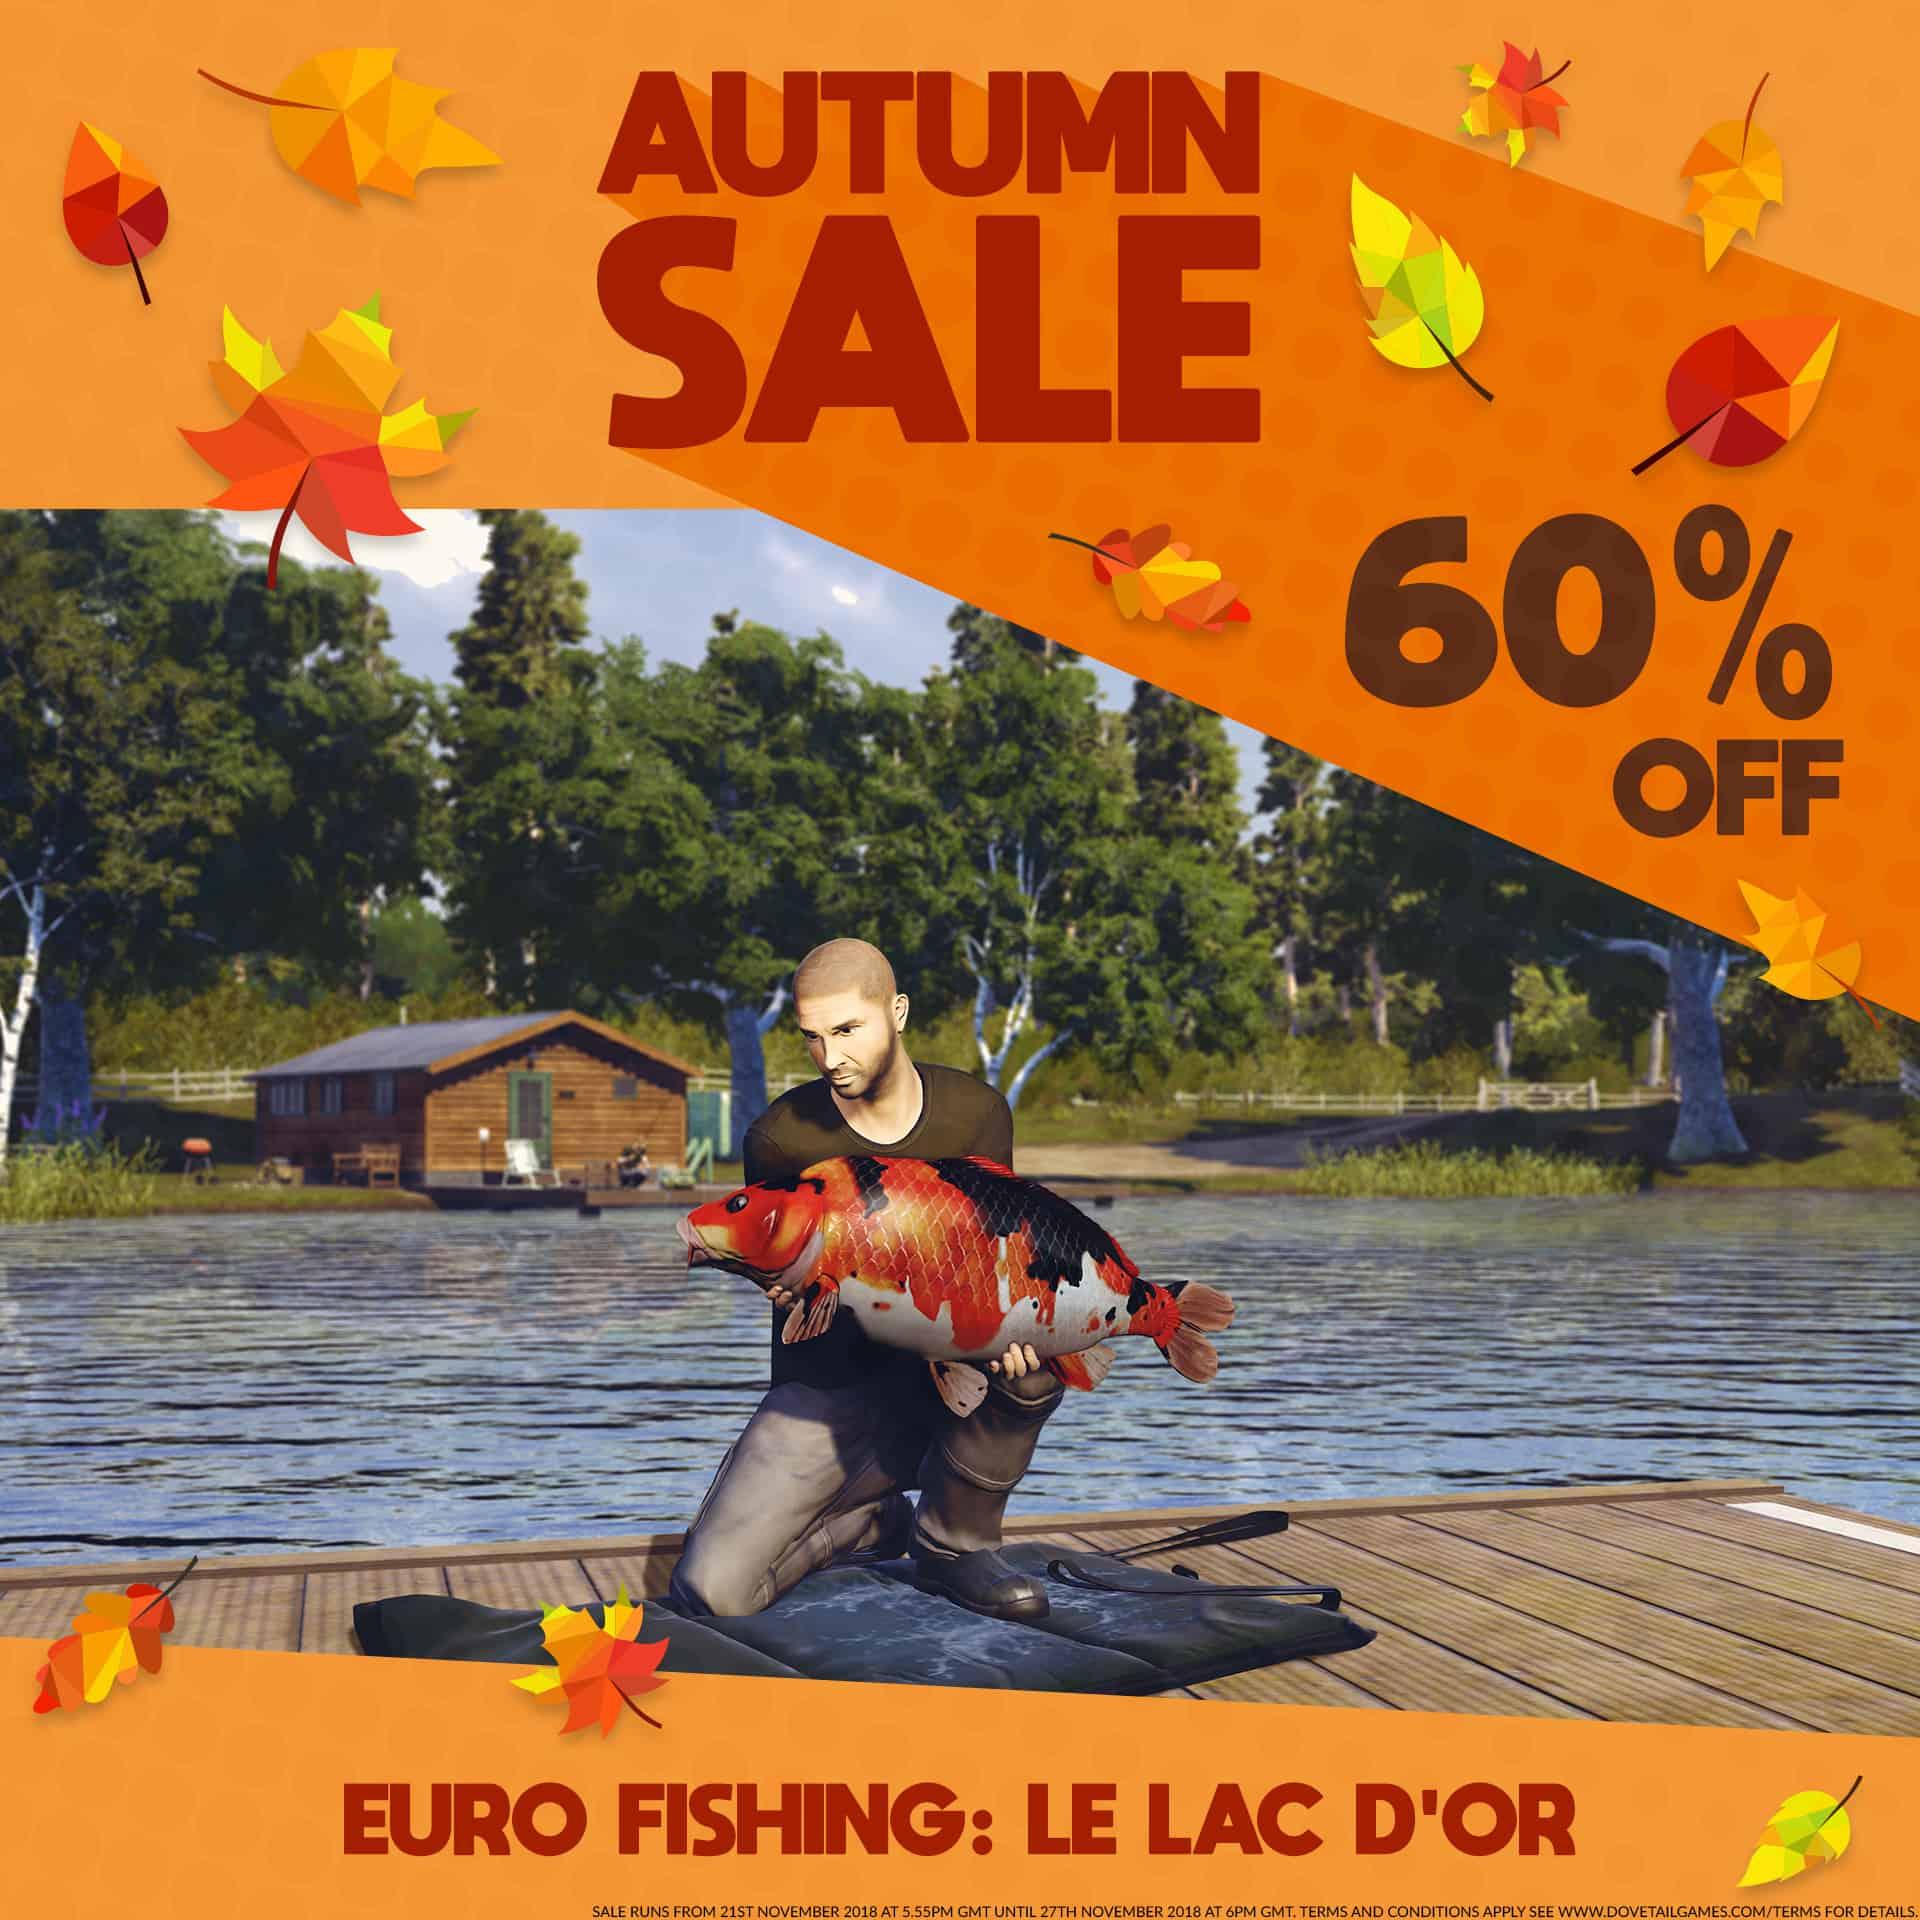 AutumnSale_Products_LeLacDOr